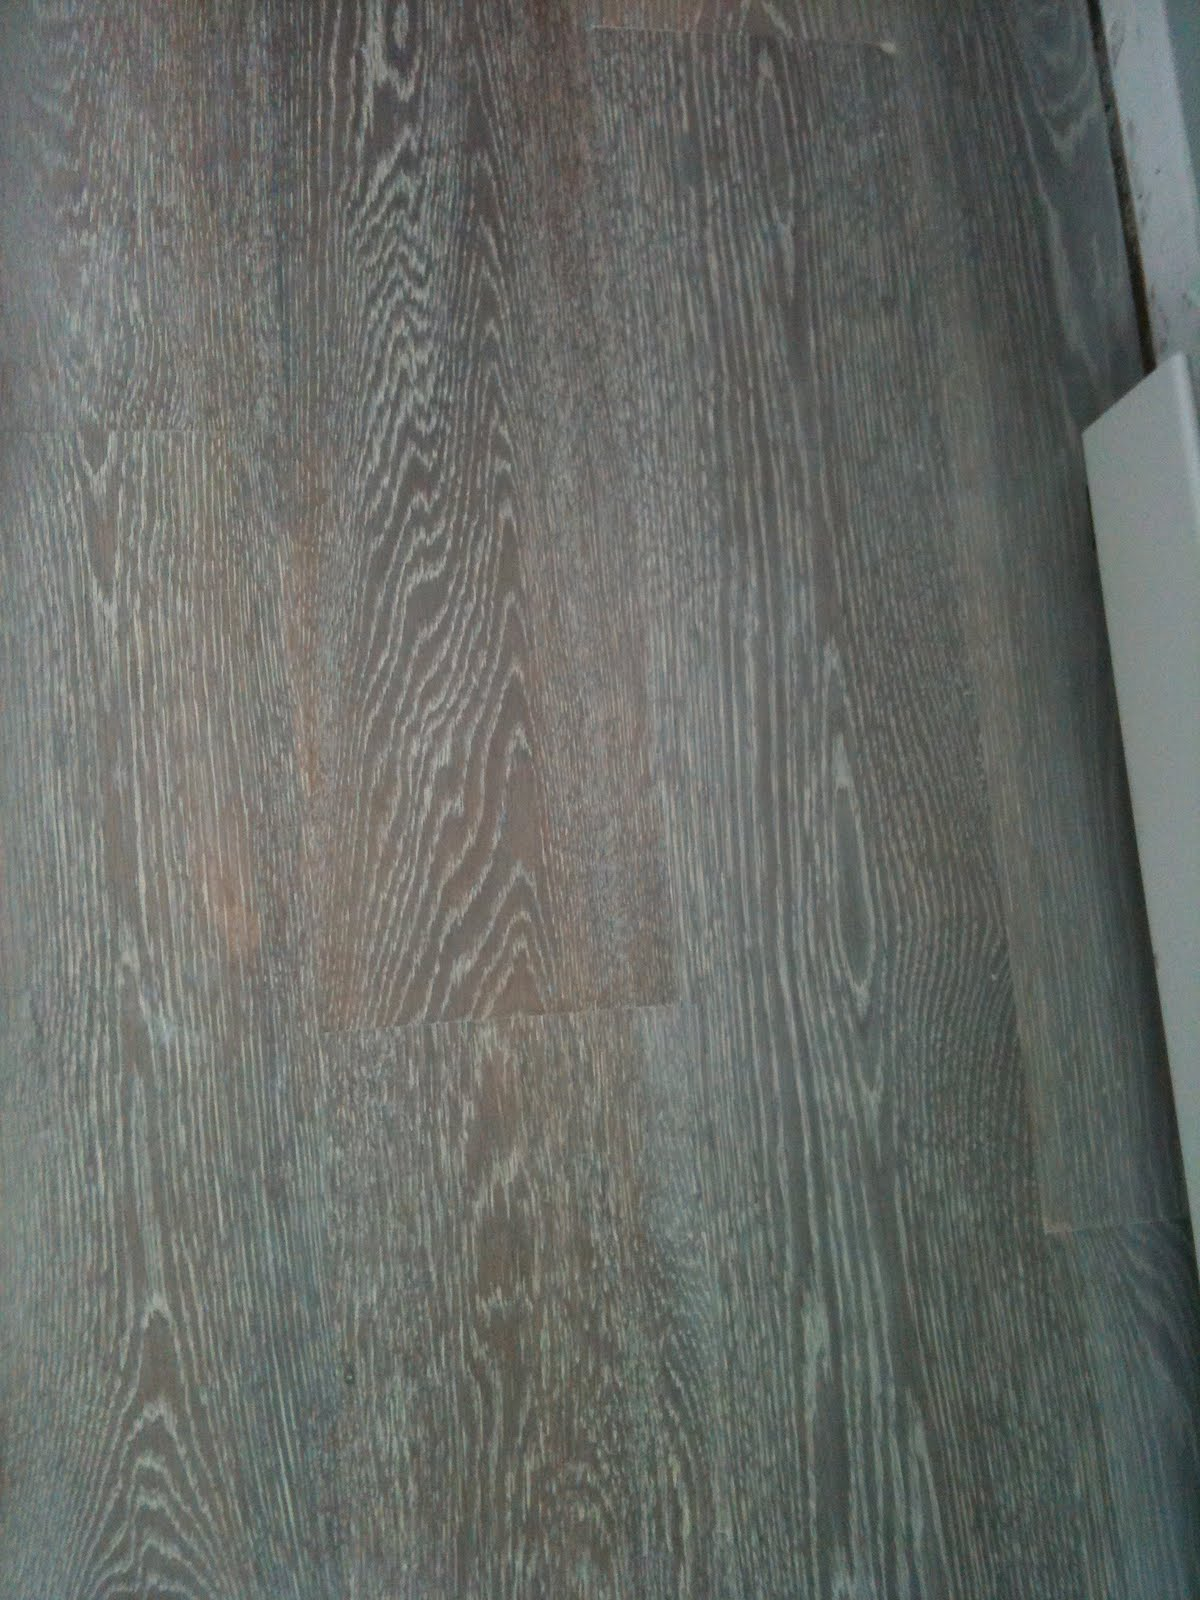 TRUE  WESSON Interior Design Project Gray Hardwood Floors